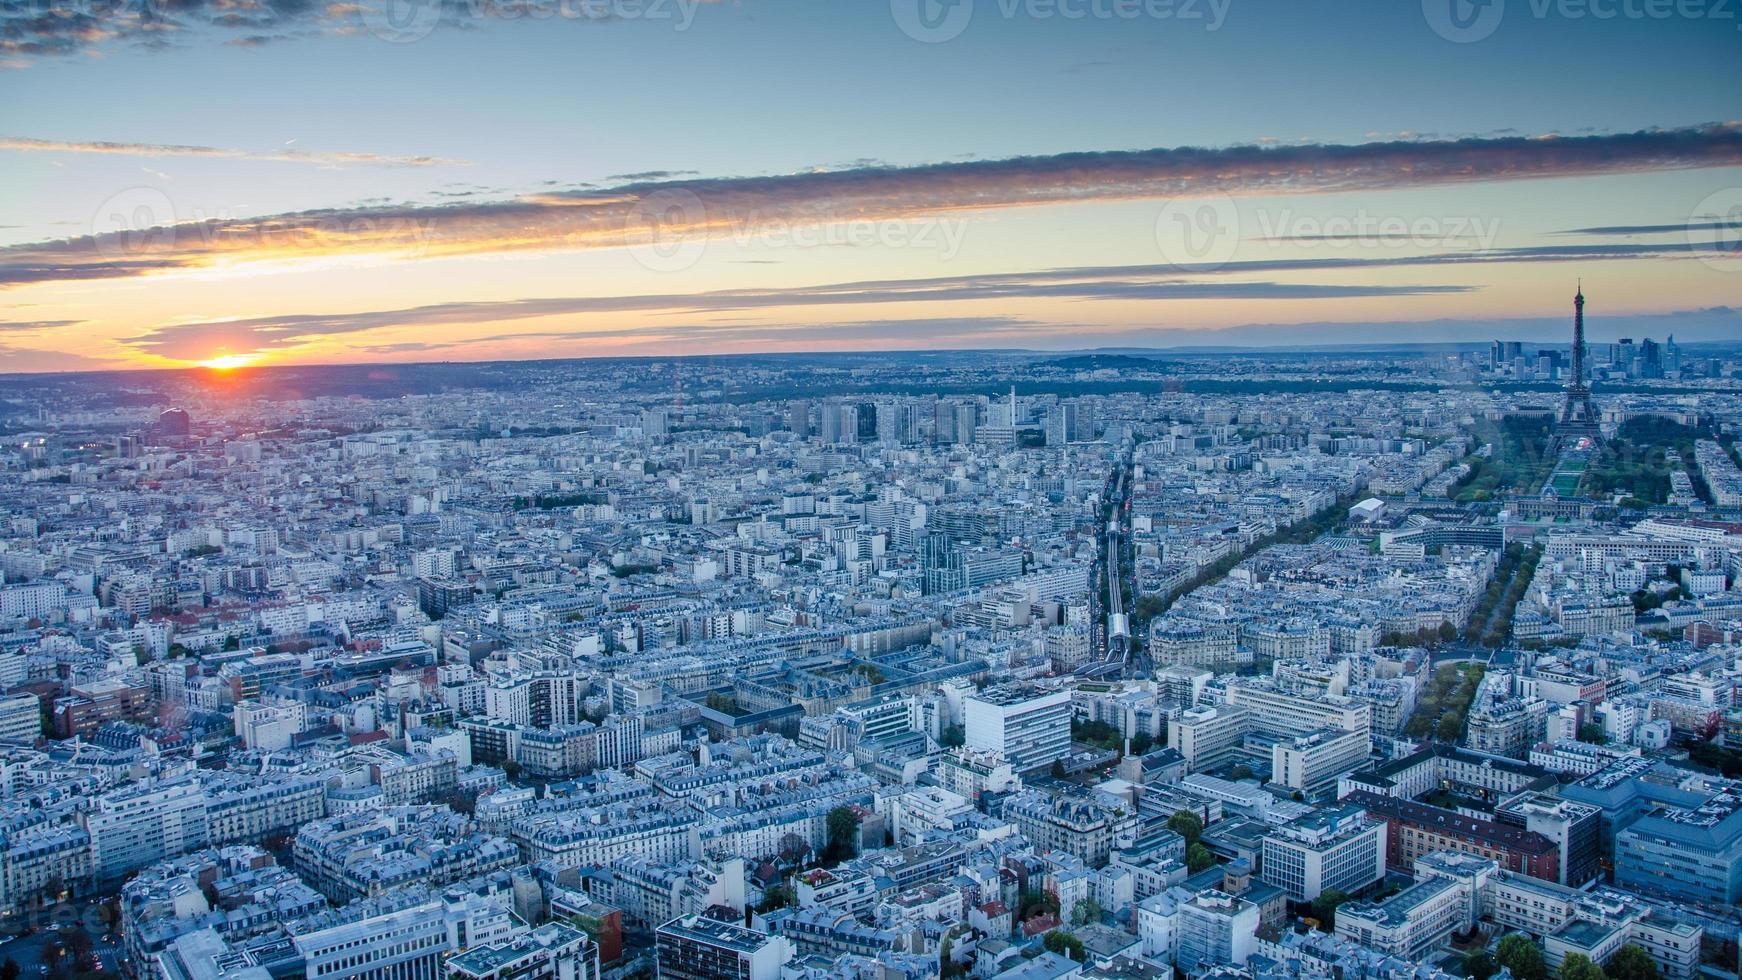 Vista aérea de París al atardecer foto